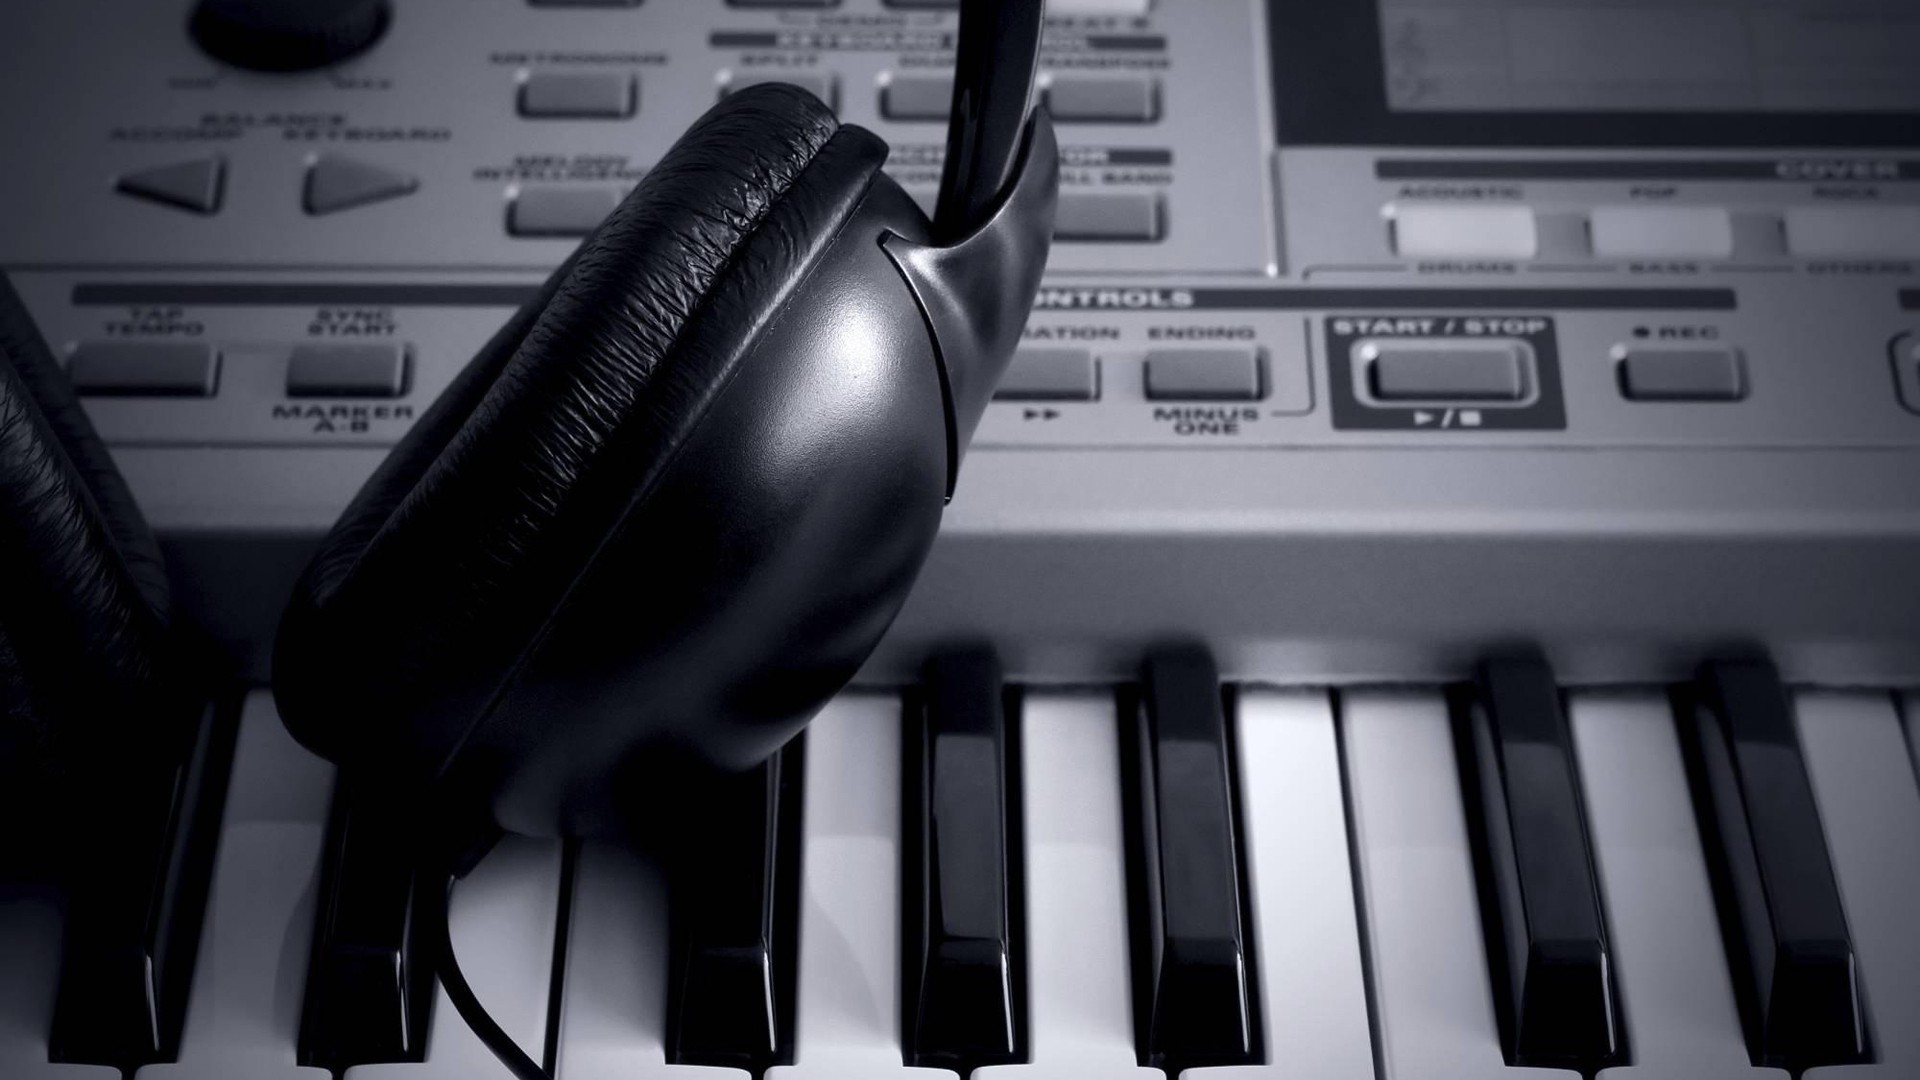 Dj Headphones Synthesizer Mixer Keyboard Piano Music Tech Wallpaper 1920x1080 40513 Wallpaperup